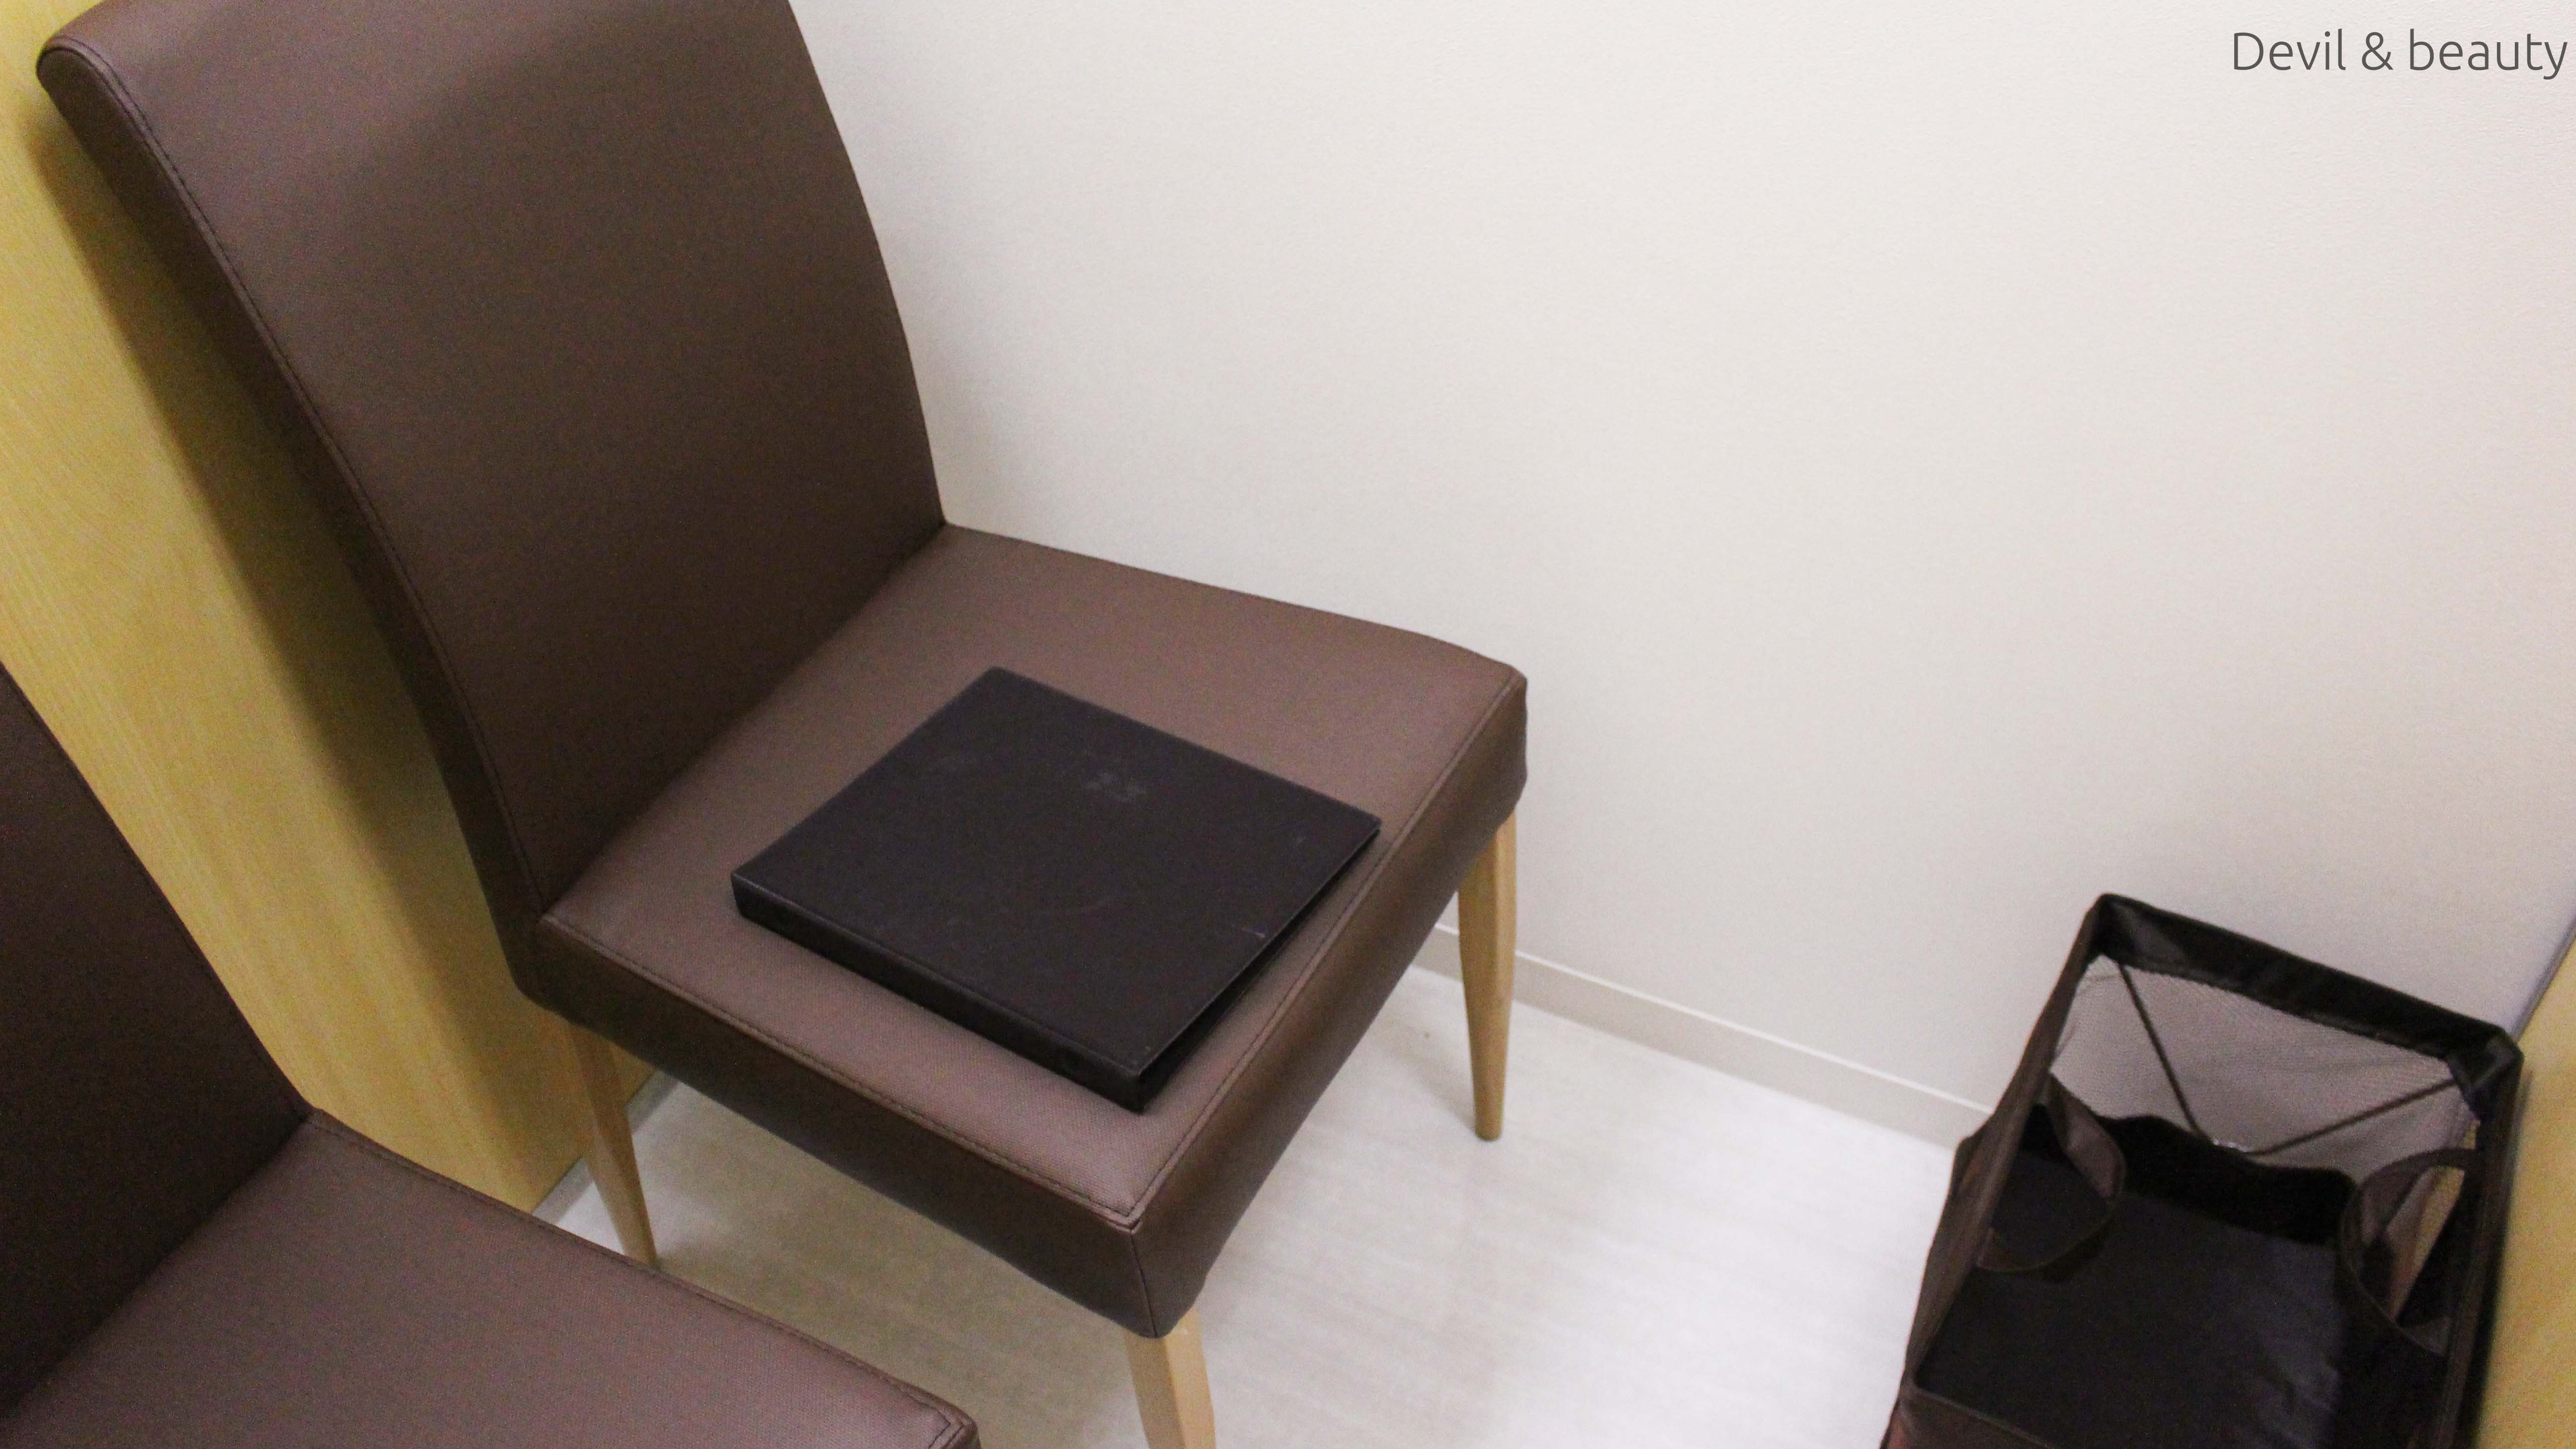 shonan-beauty-clinic-shinjuku7 - image